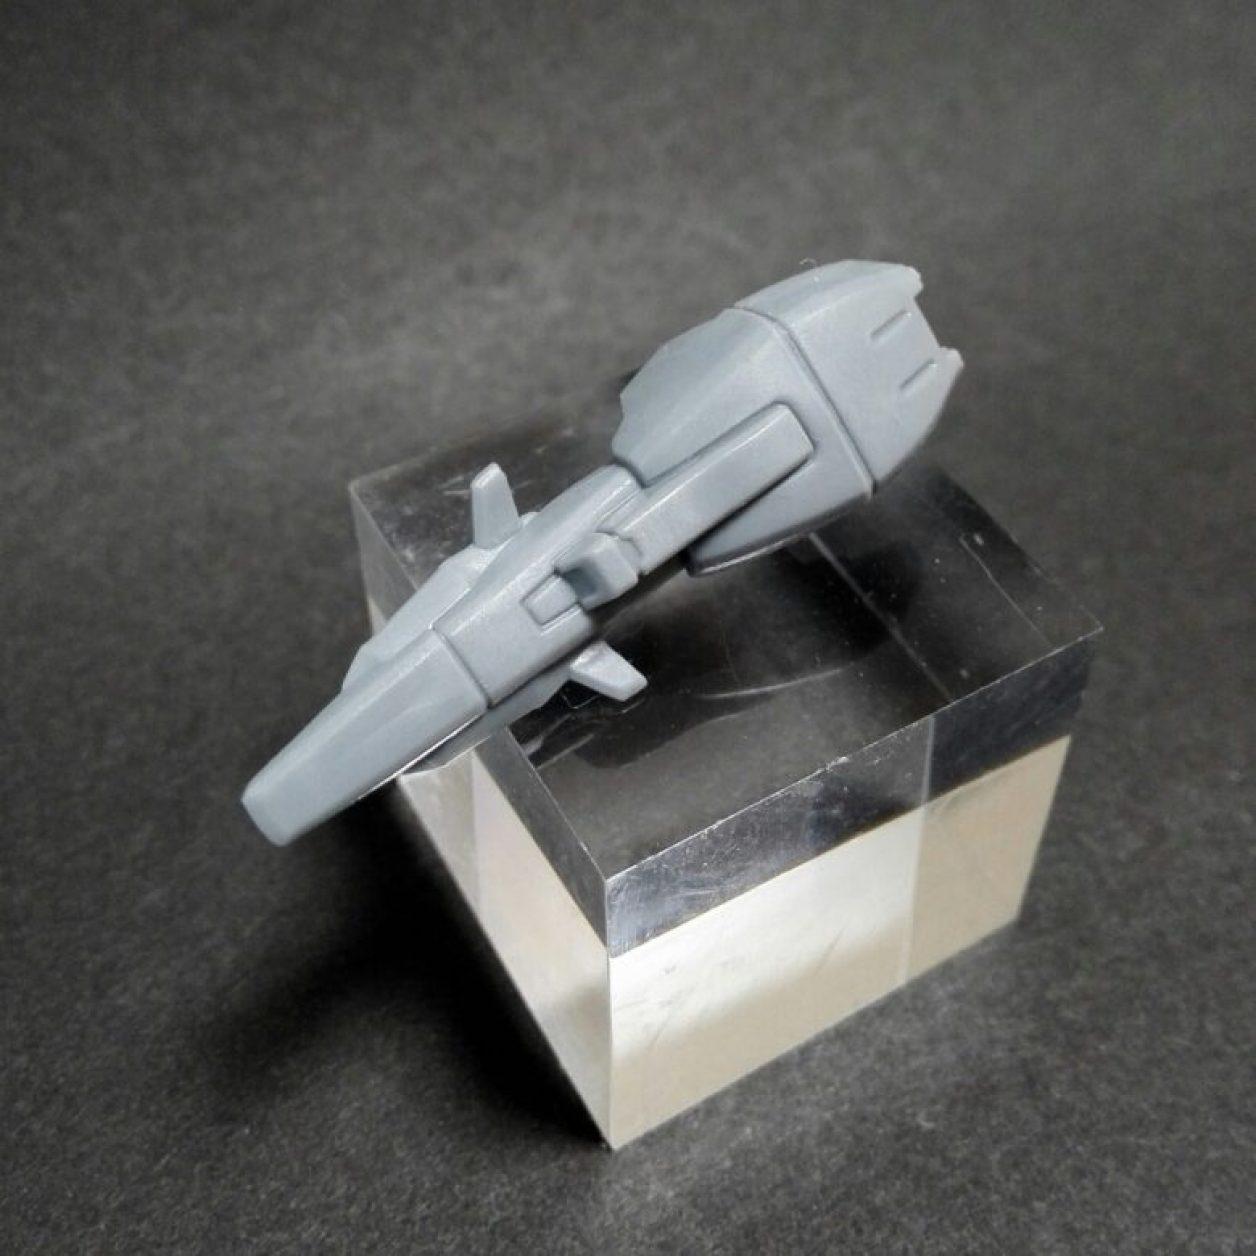 mobile suite ensemble(モビルスーツアンサンブル)14弾のゼータプラスの初期武装のシールドの画像